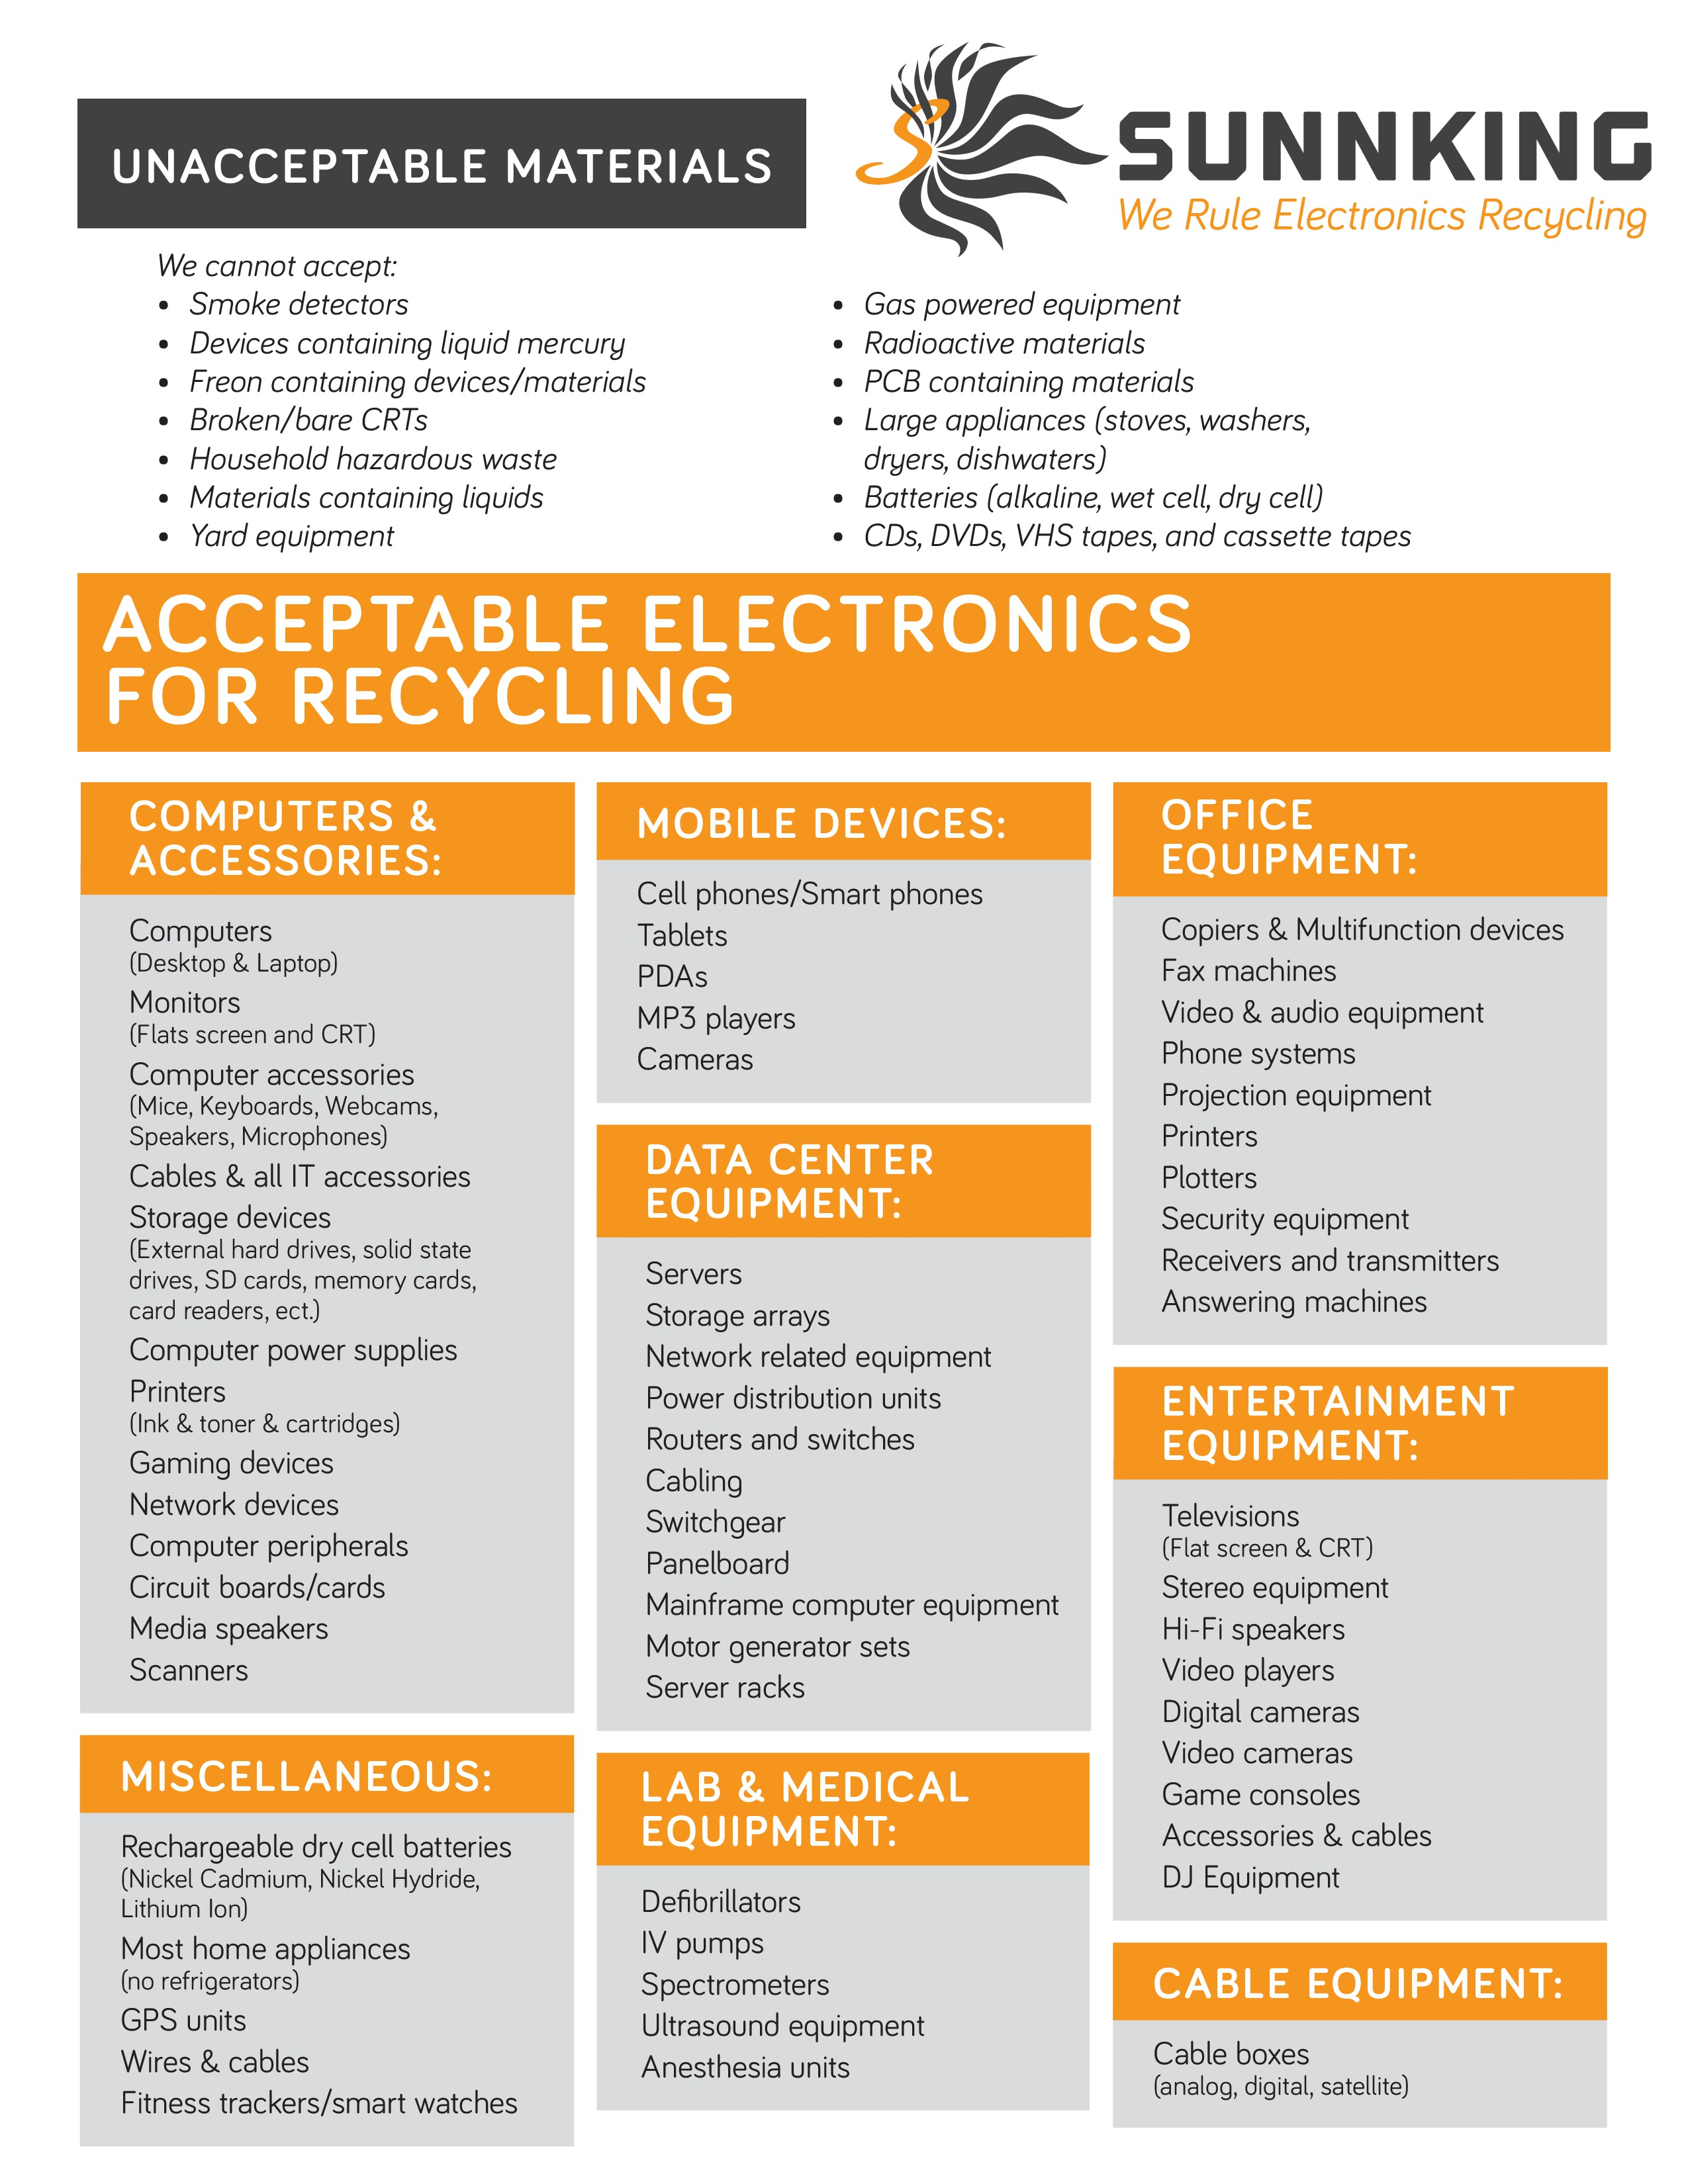 Acceptable-materials-list-sunnking_2018.jpg